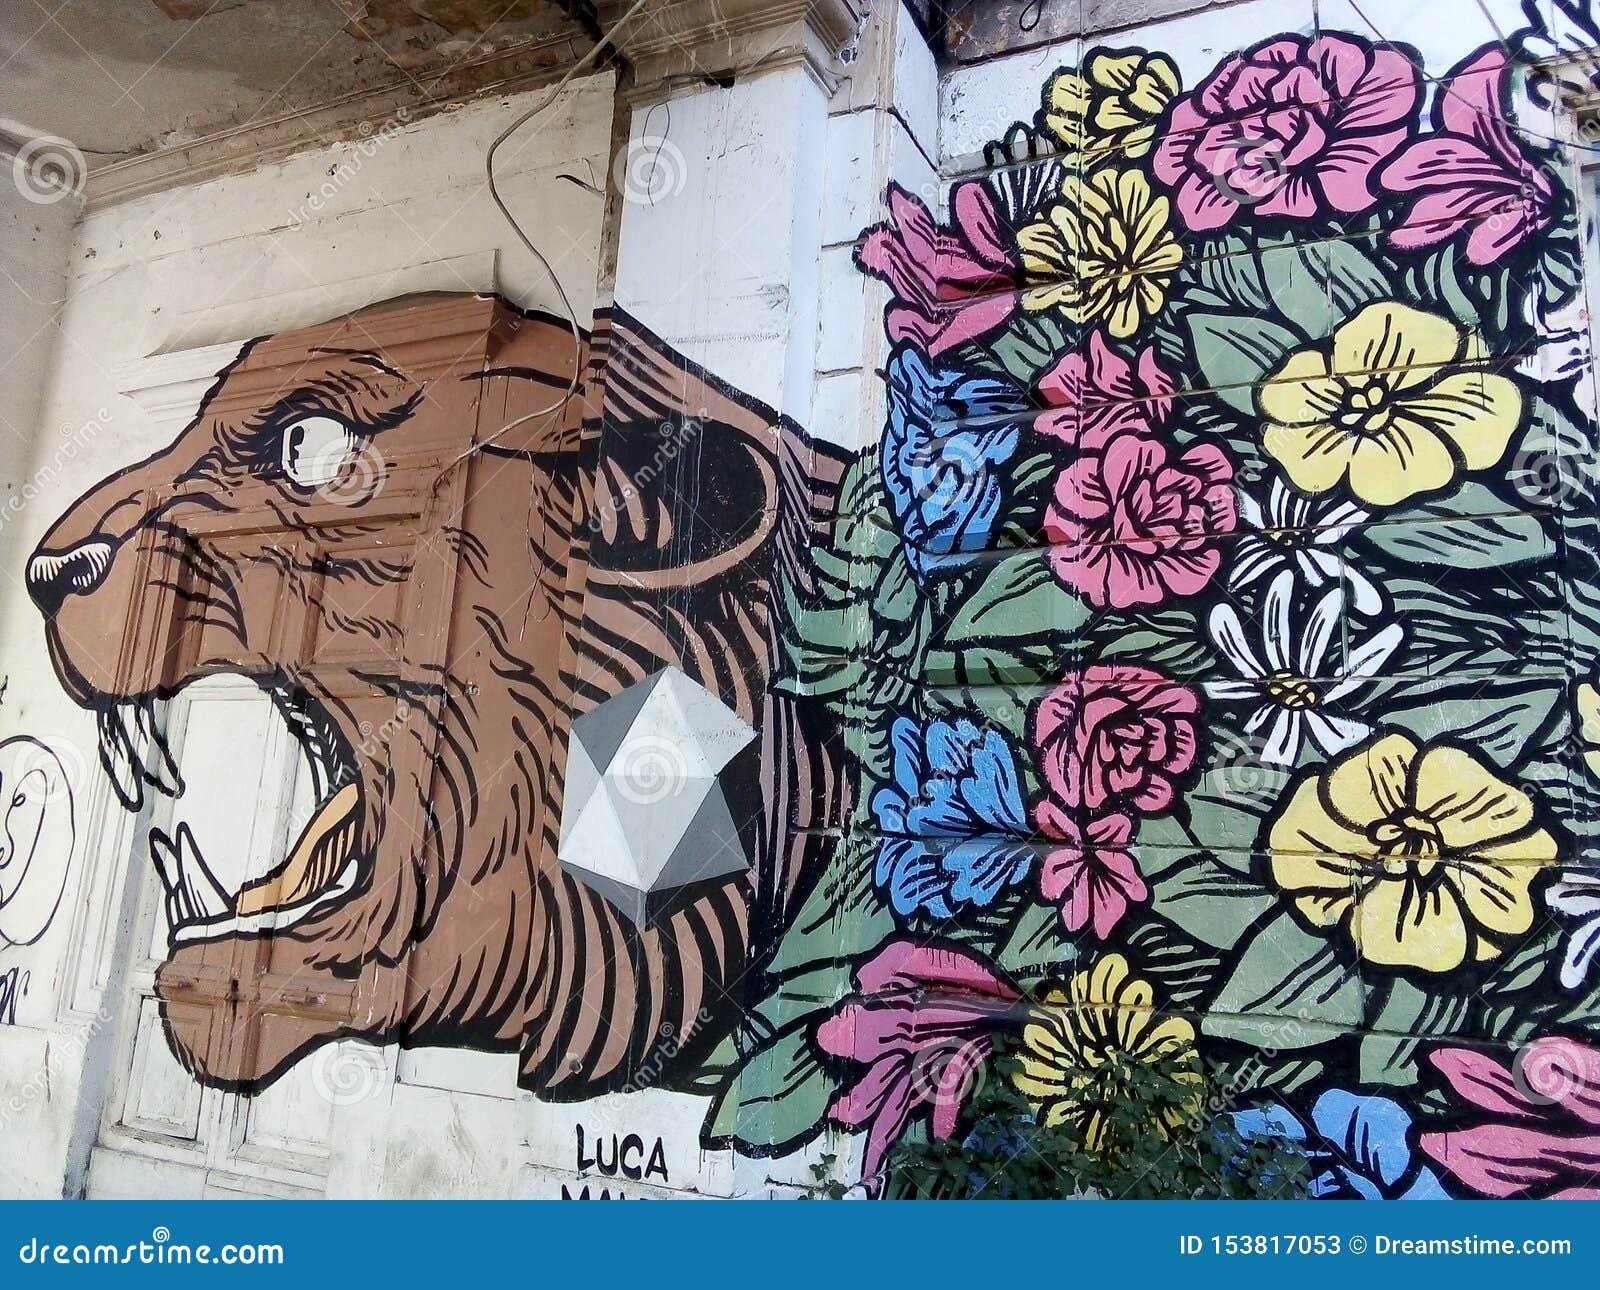 Roma Testaccio Street Art